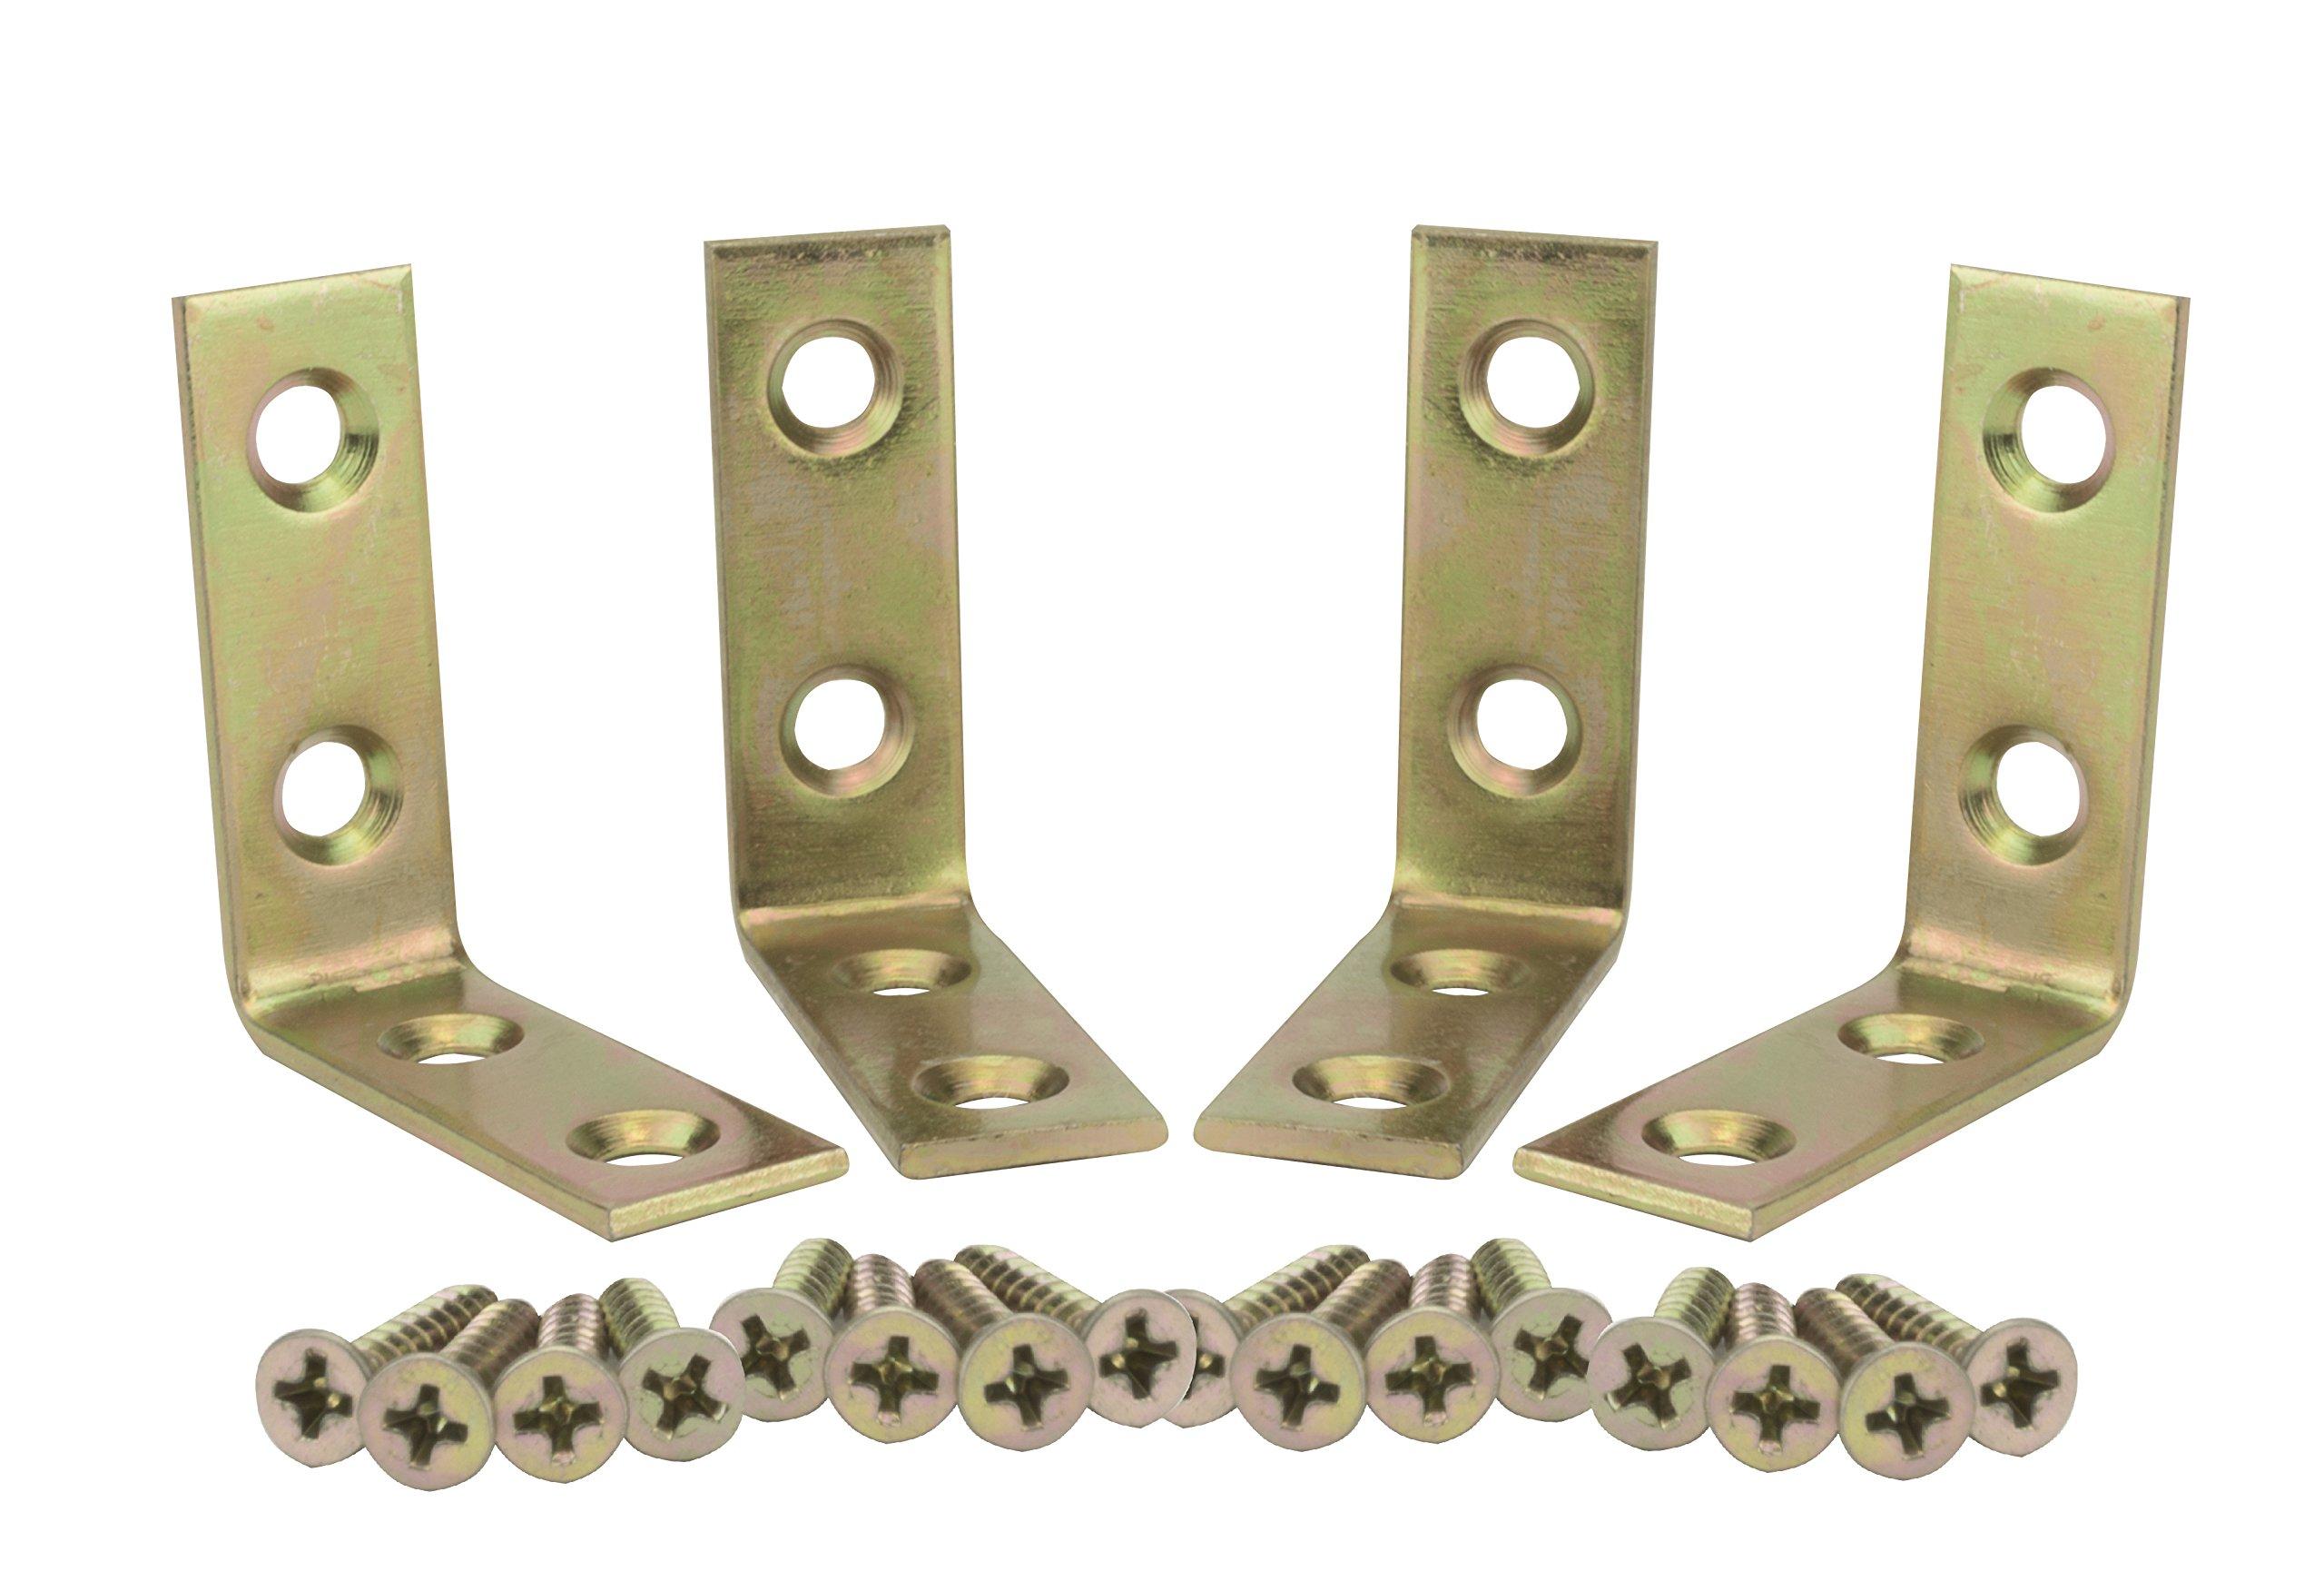 Corner Brace1-1/2 inch Zinc Plated 160pcs (Brass)